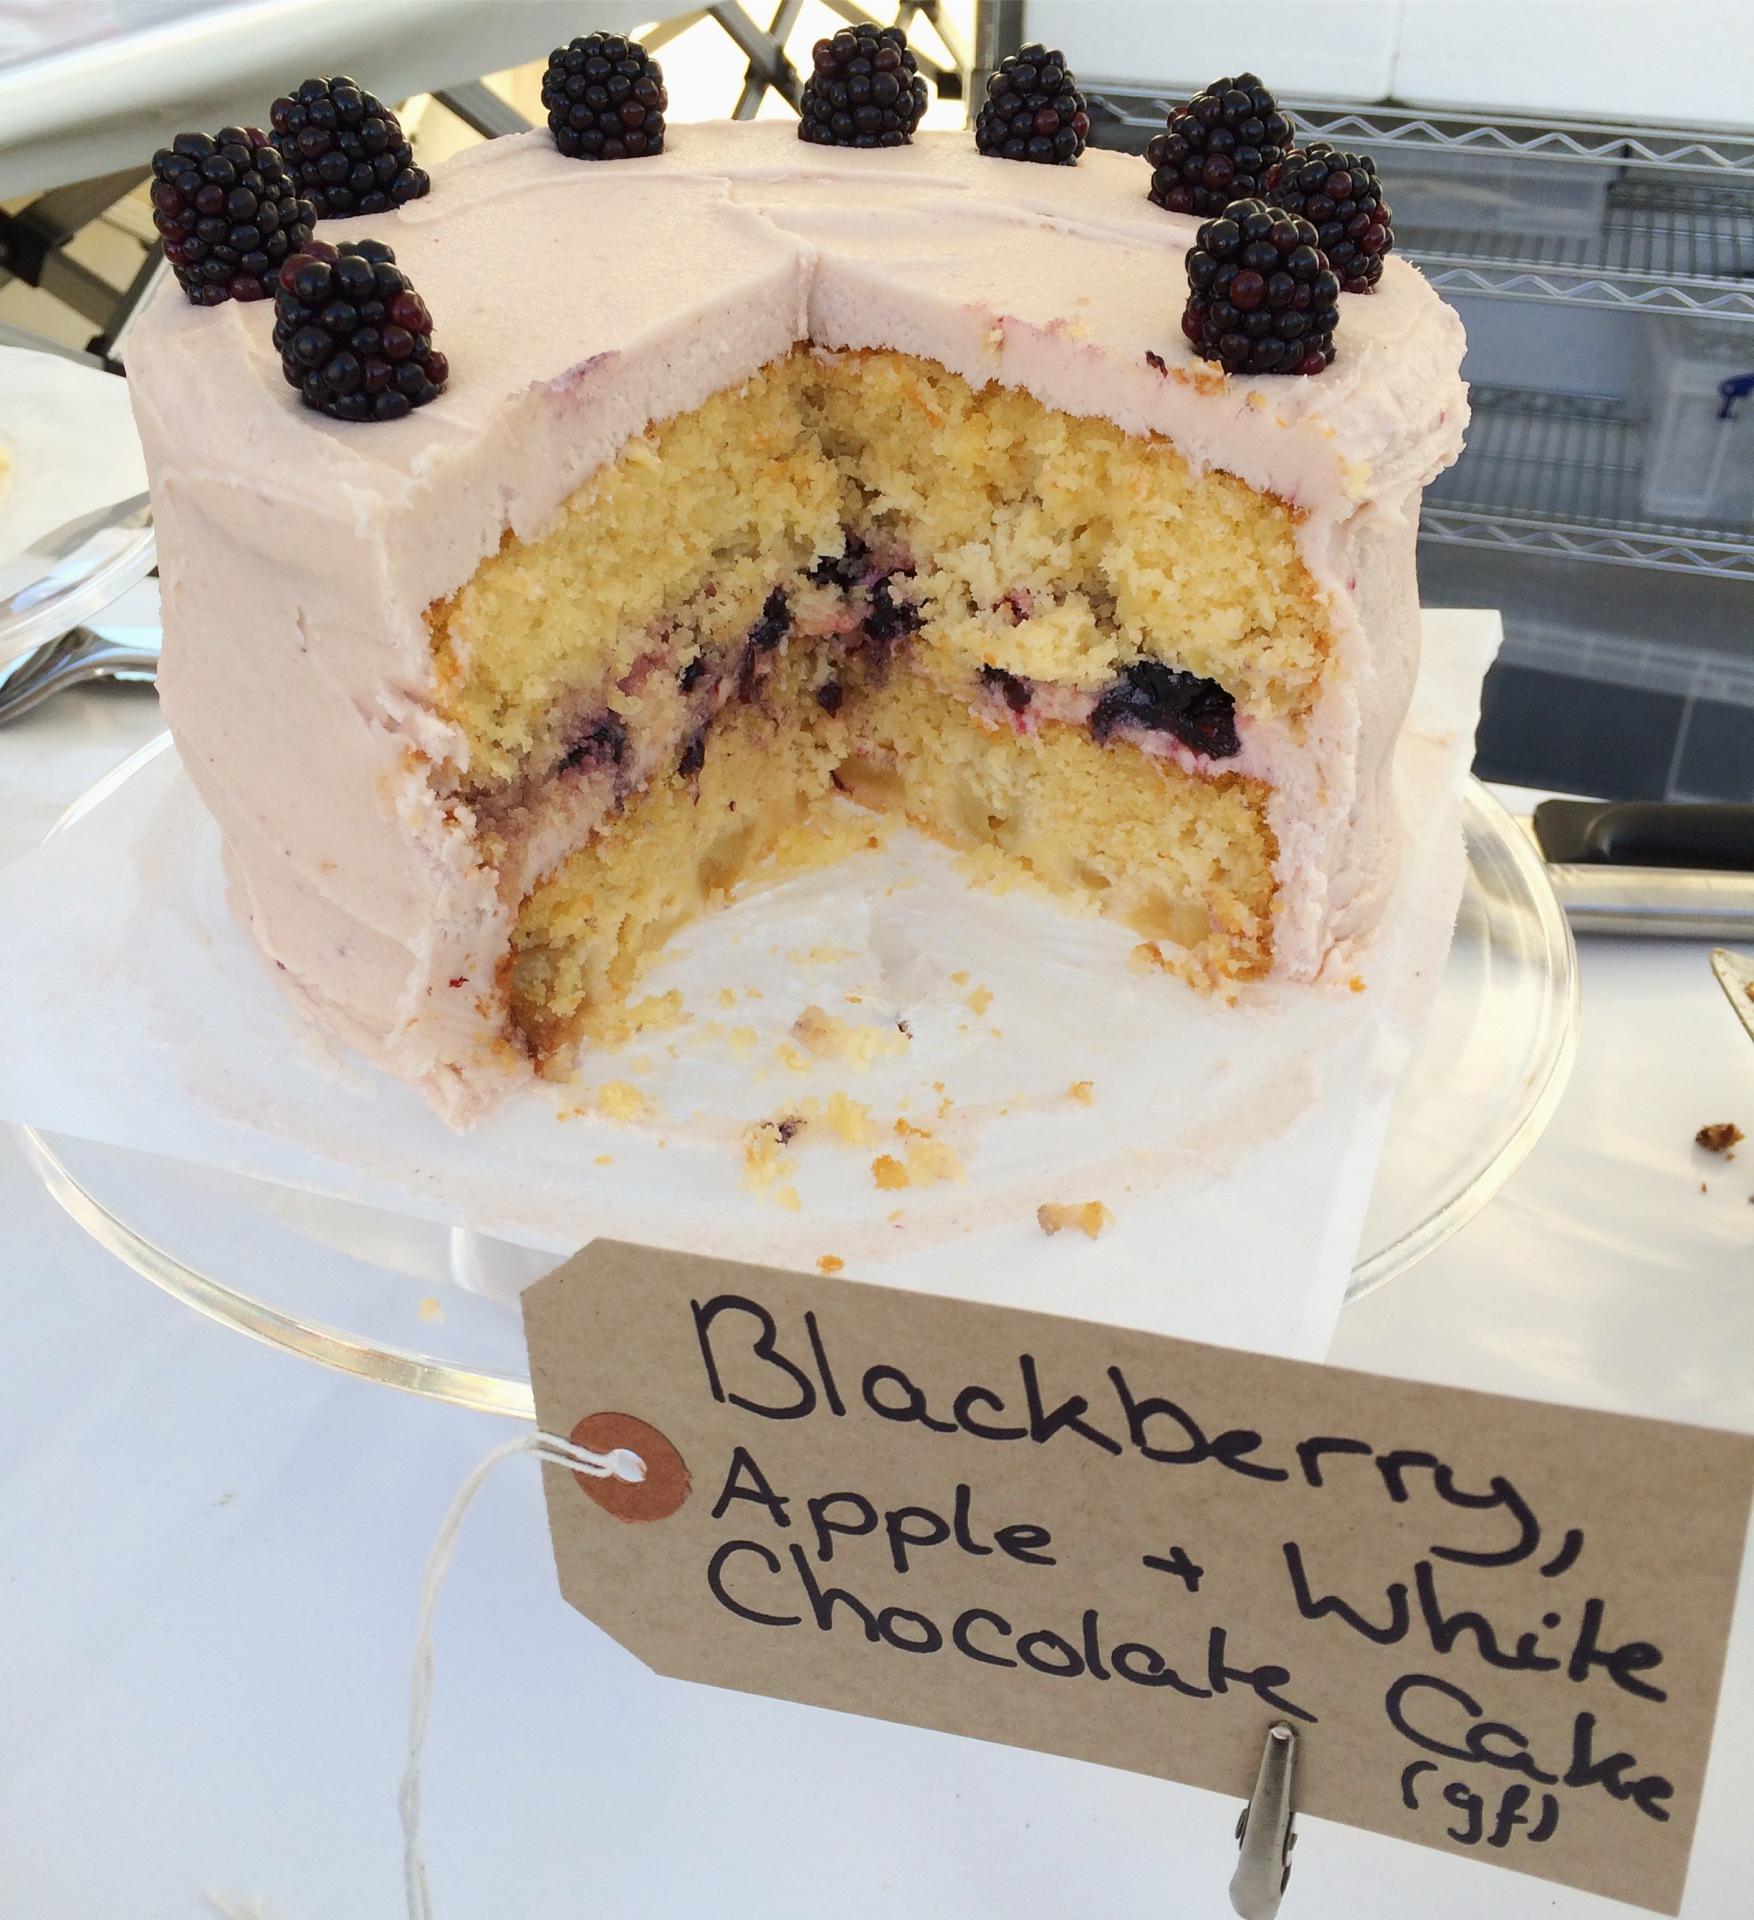 Blackberry, Apple and White Chocolate Cake